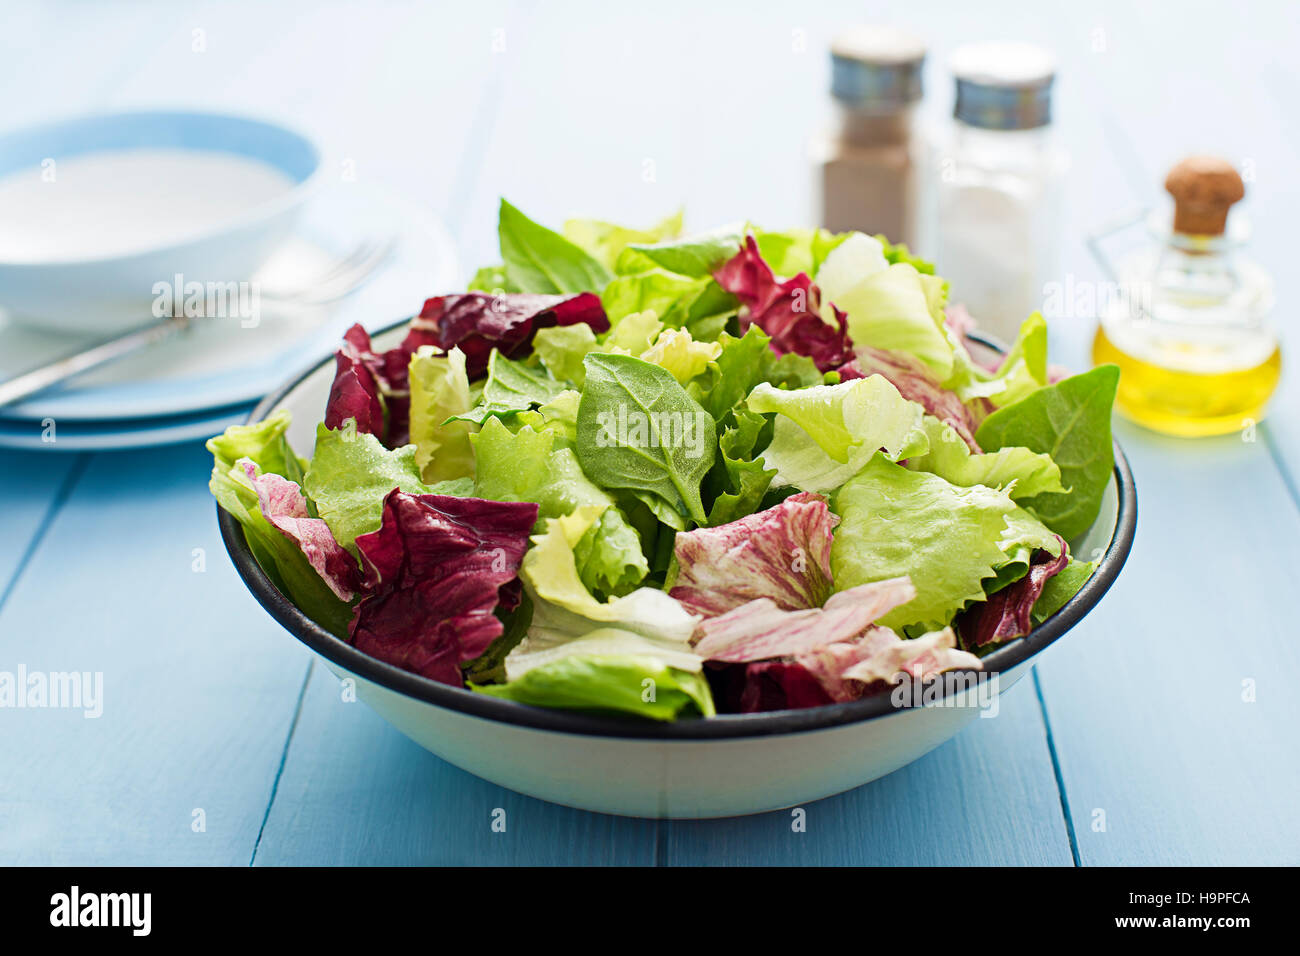 Fresca ensalada verde mixta en un tazón cerrar Imagen De Stock